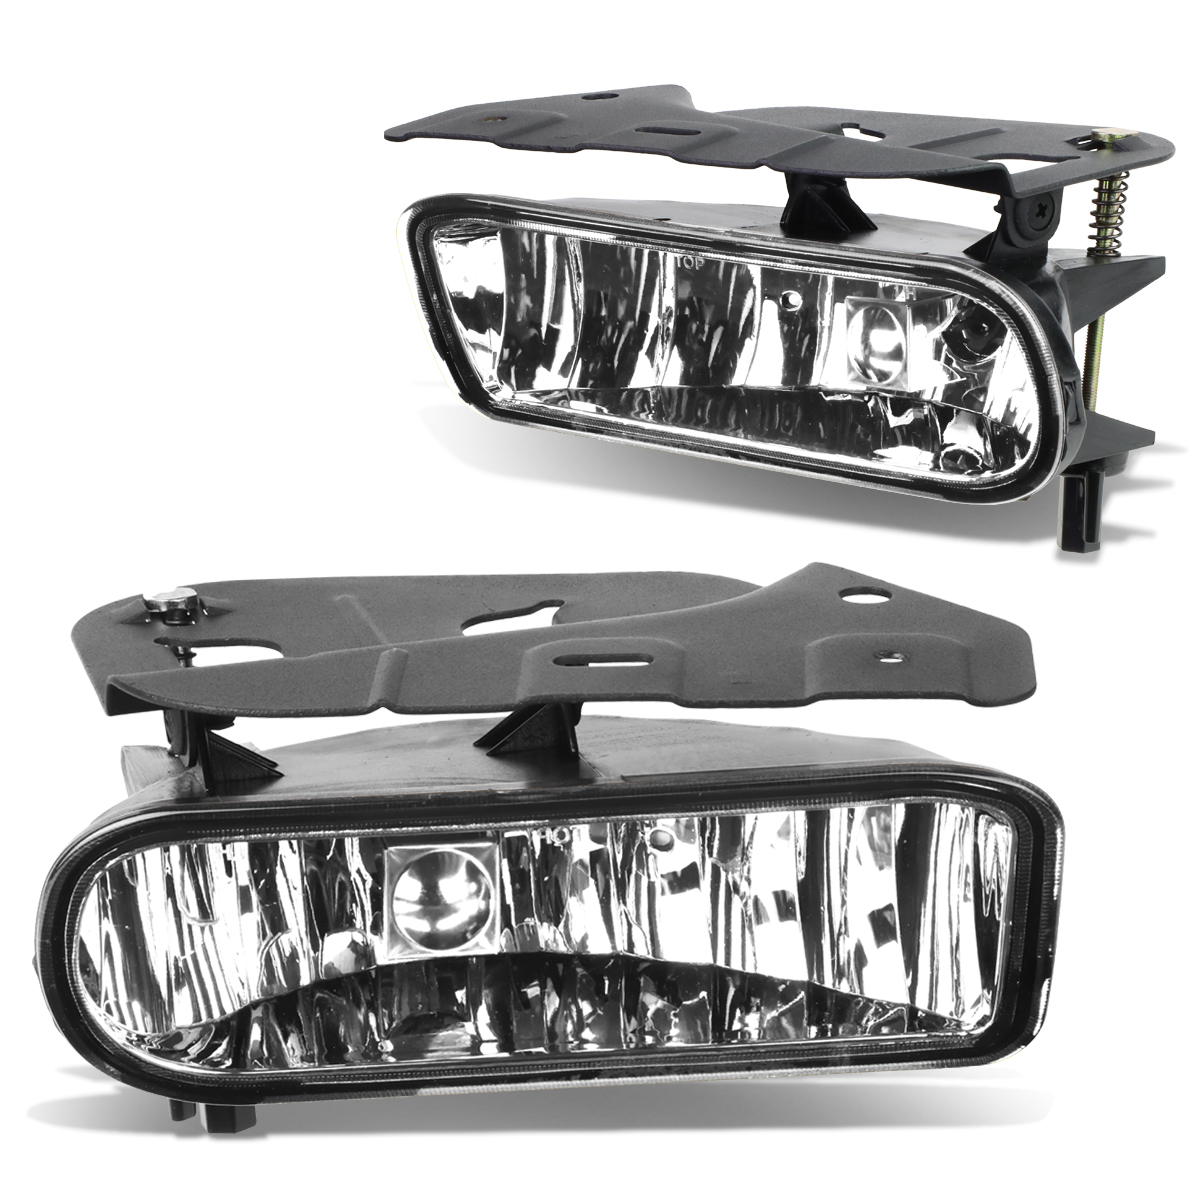 For 02-06 Cadillac Escalade EXT ESV Pair Bumper Driving Fog Light/Lamp Clear Lens 03 04 05